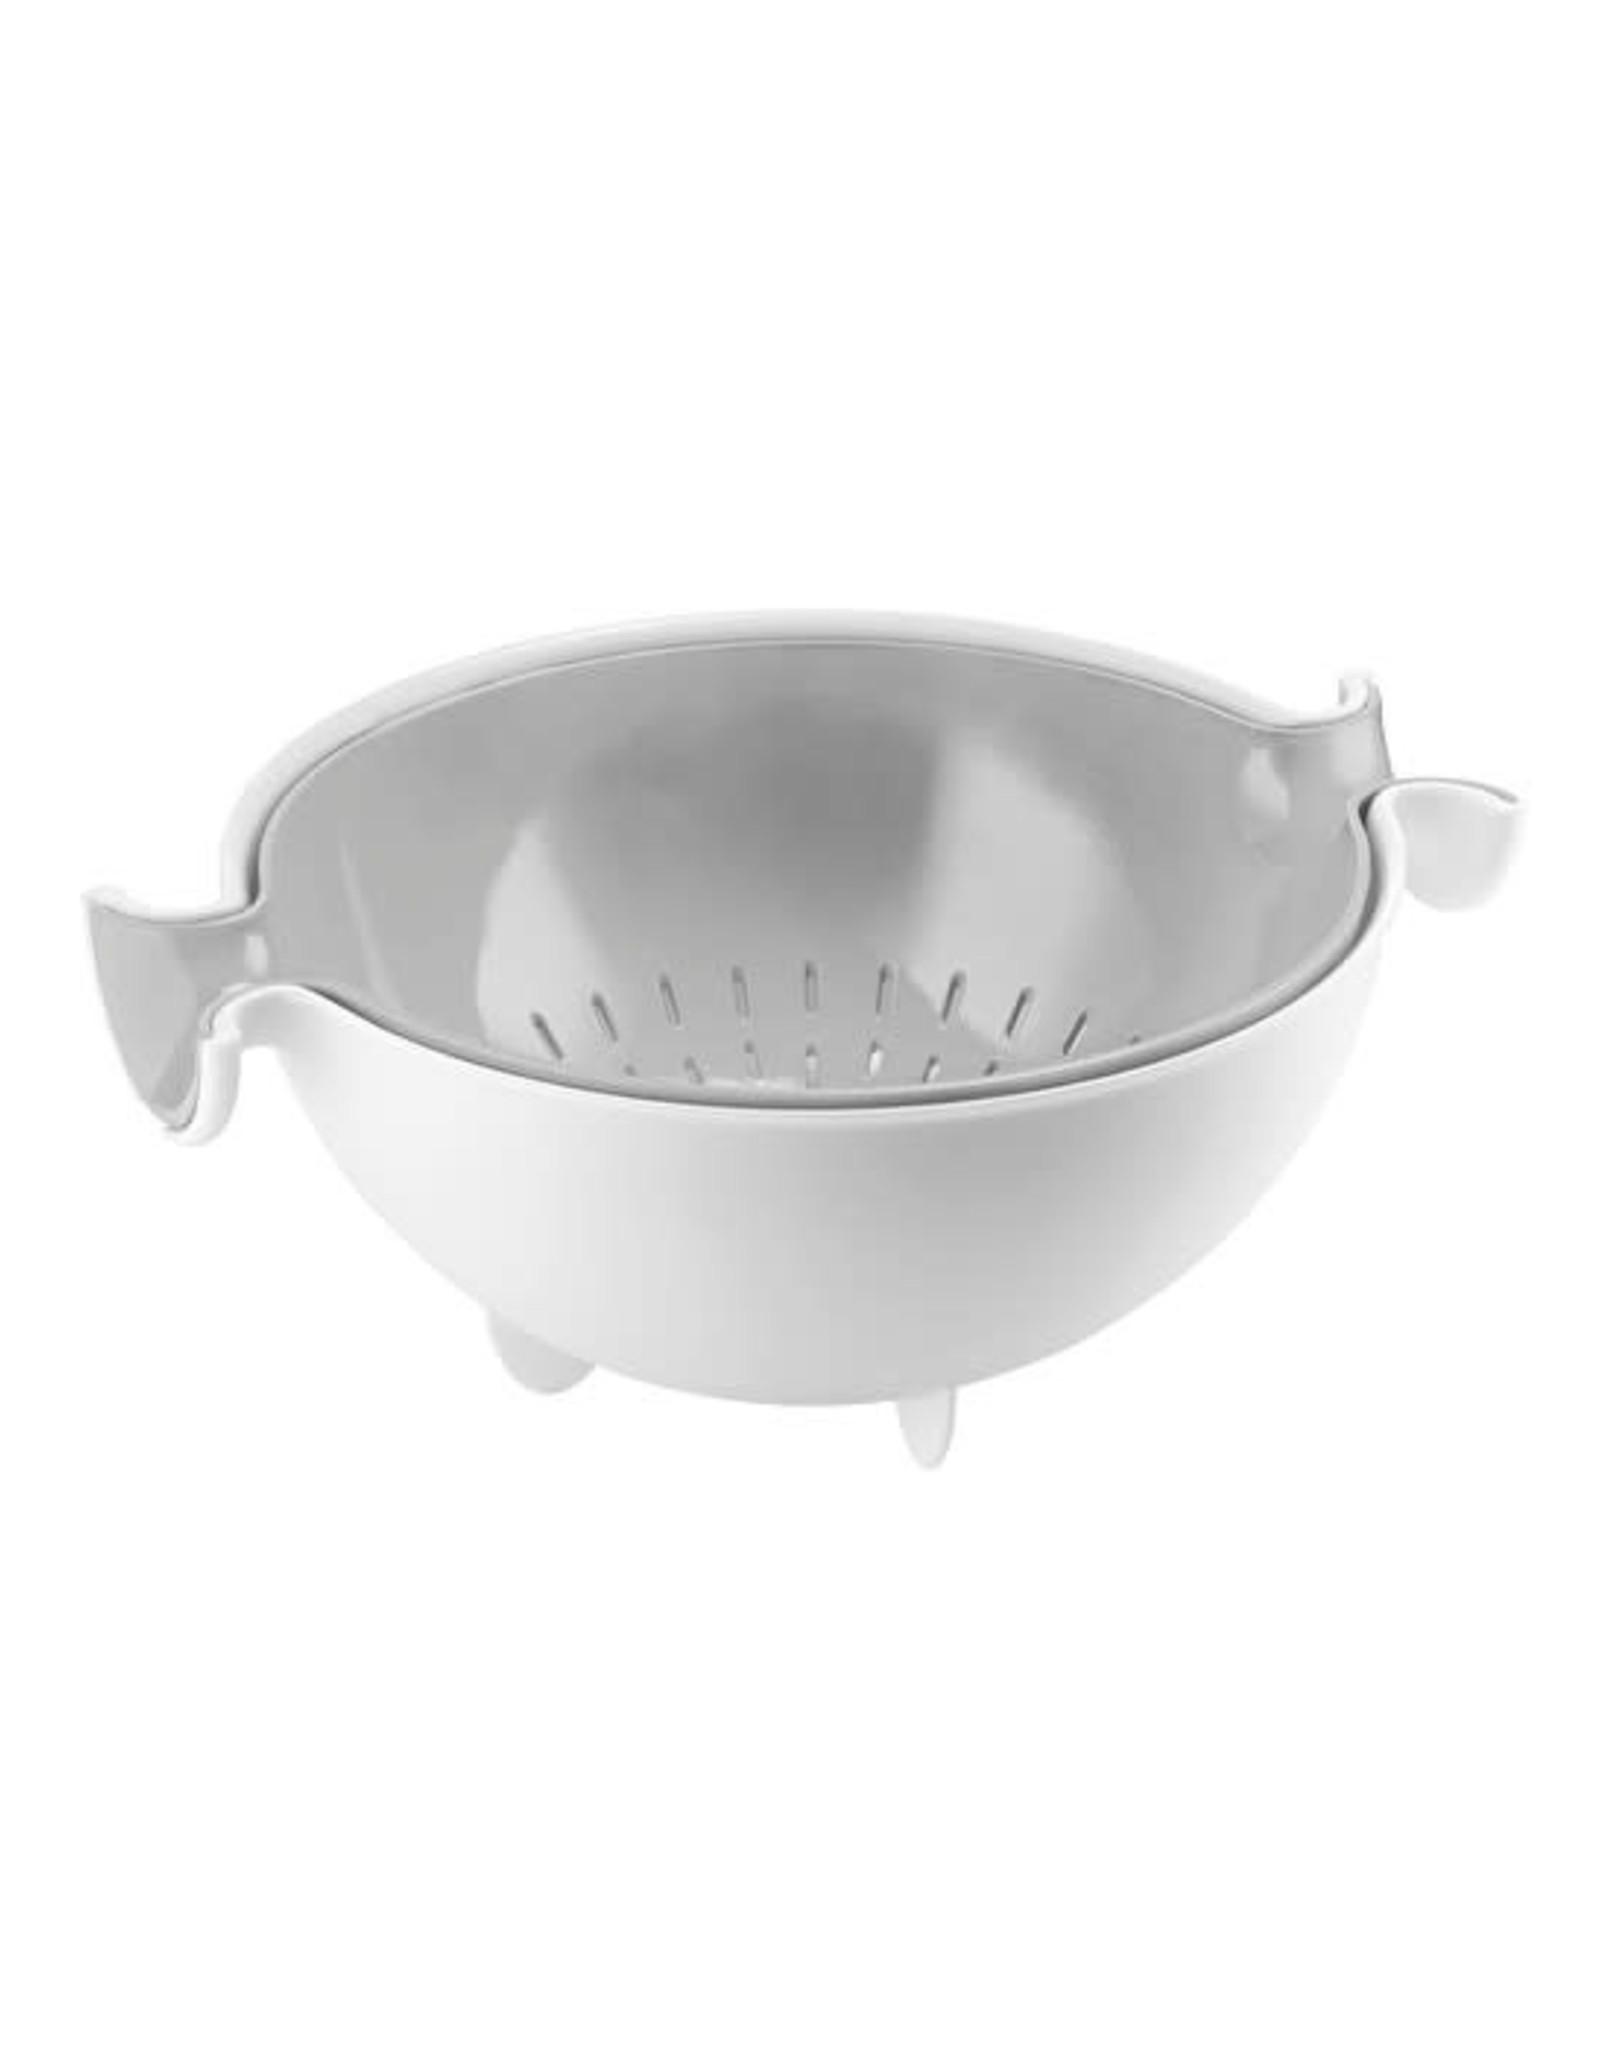 Guzzini My Kitchen Colander and Bowl Set Spin&Drain